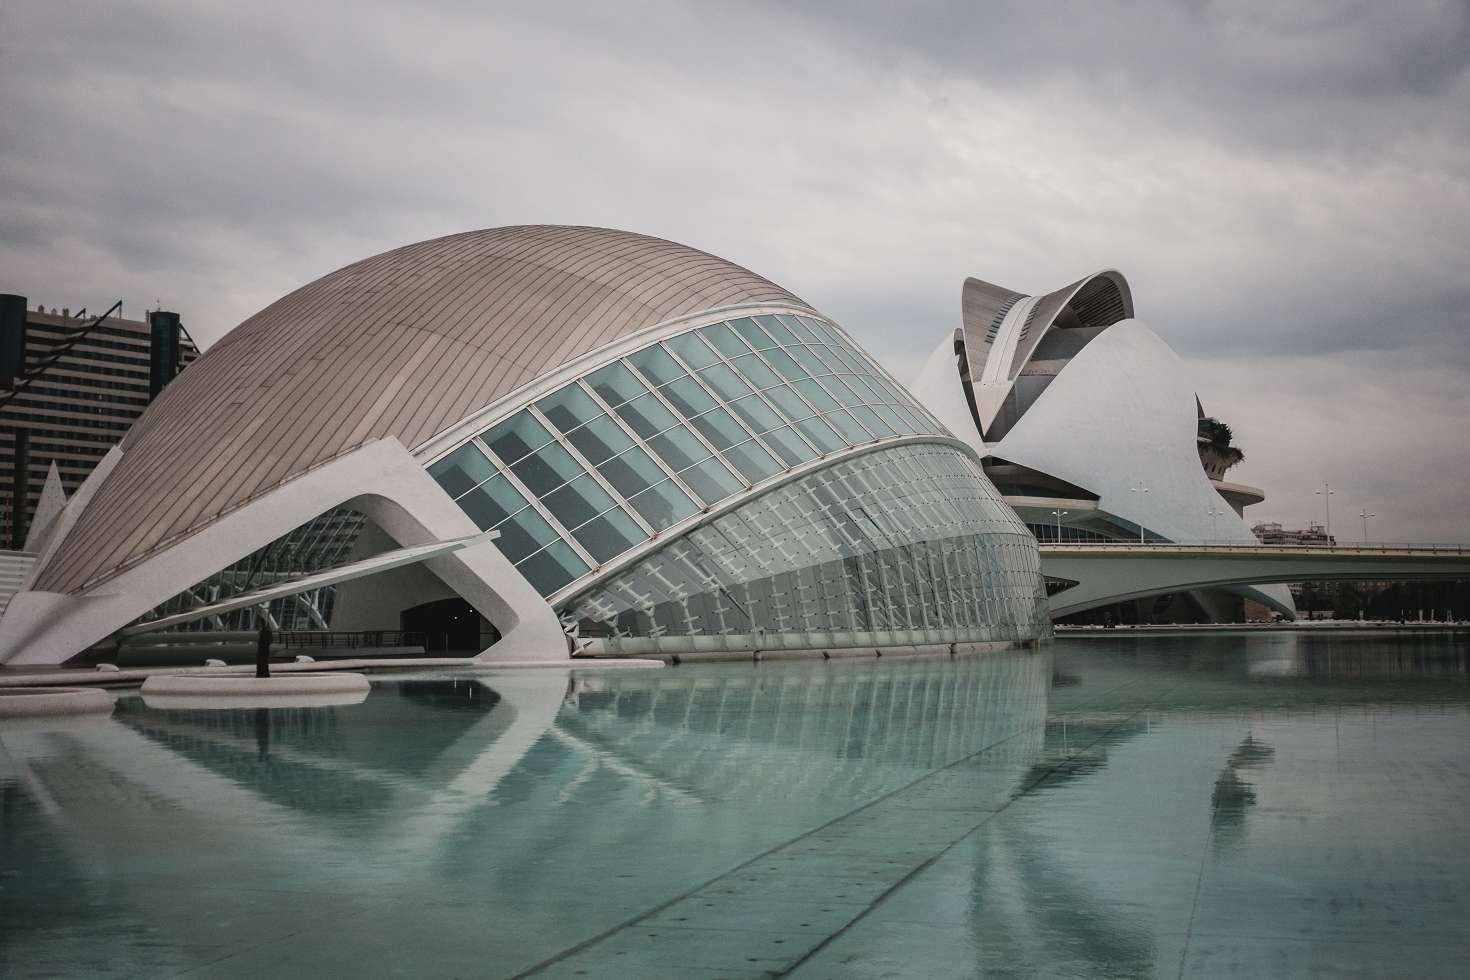 Valencia-Lissabon-Vigo-Stonehenge (3)